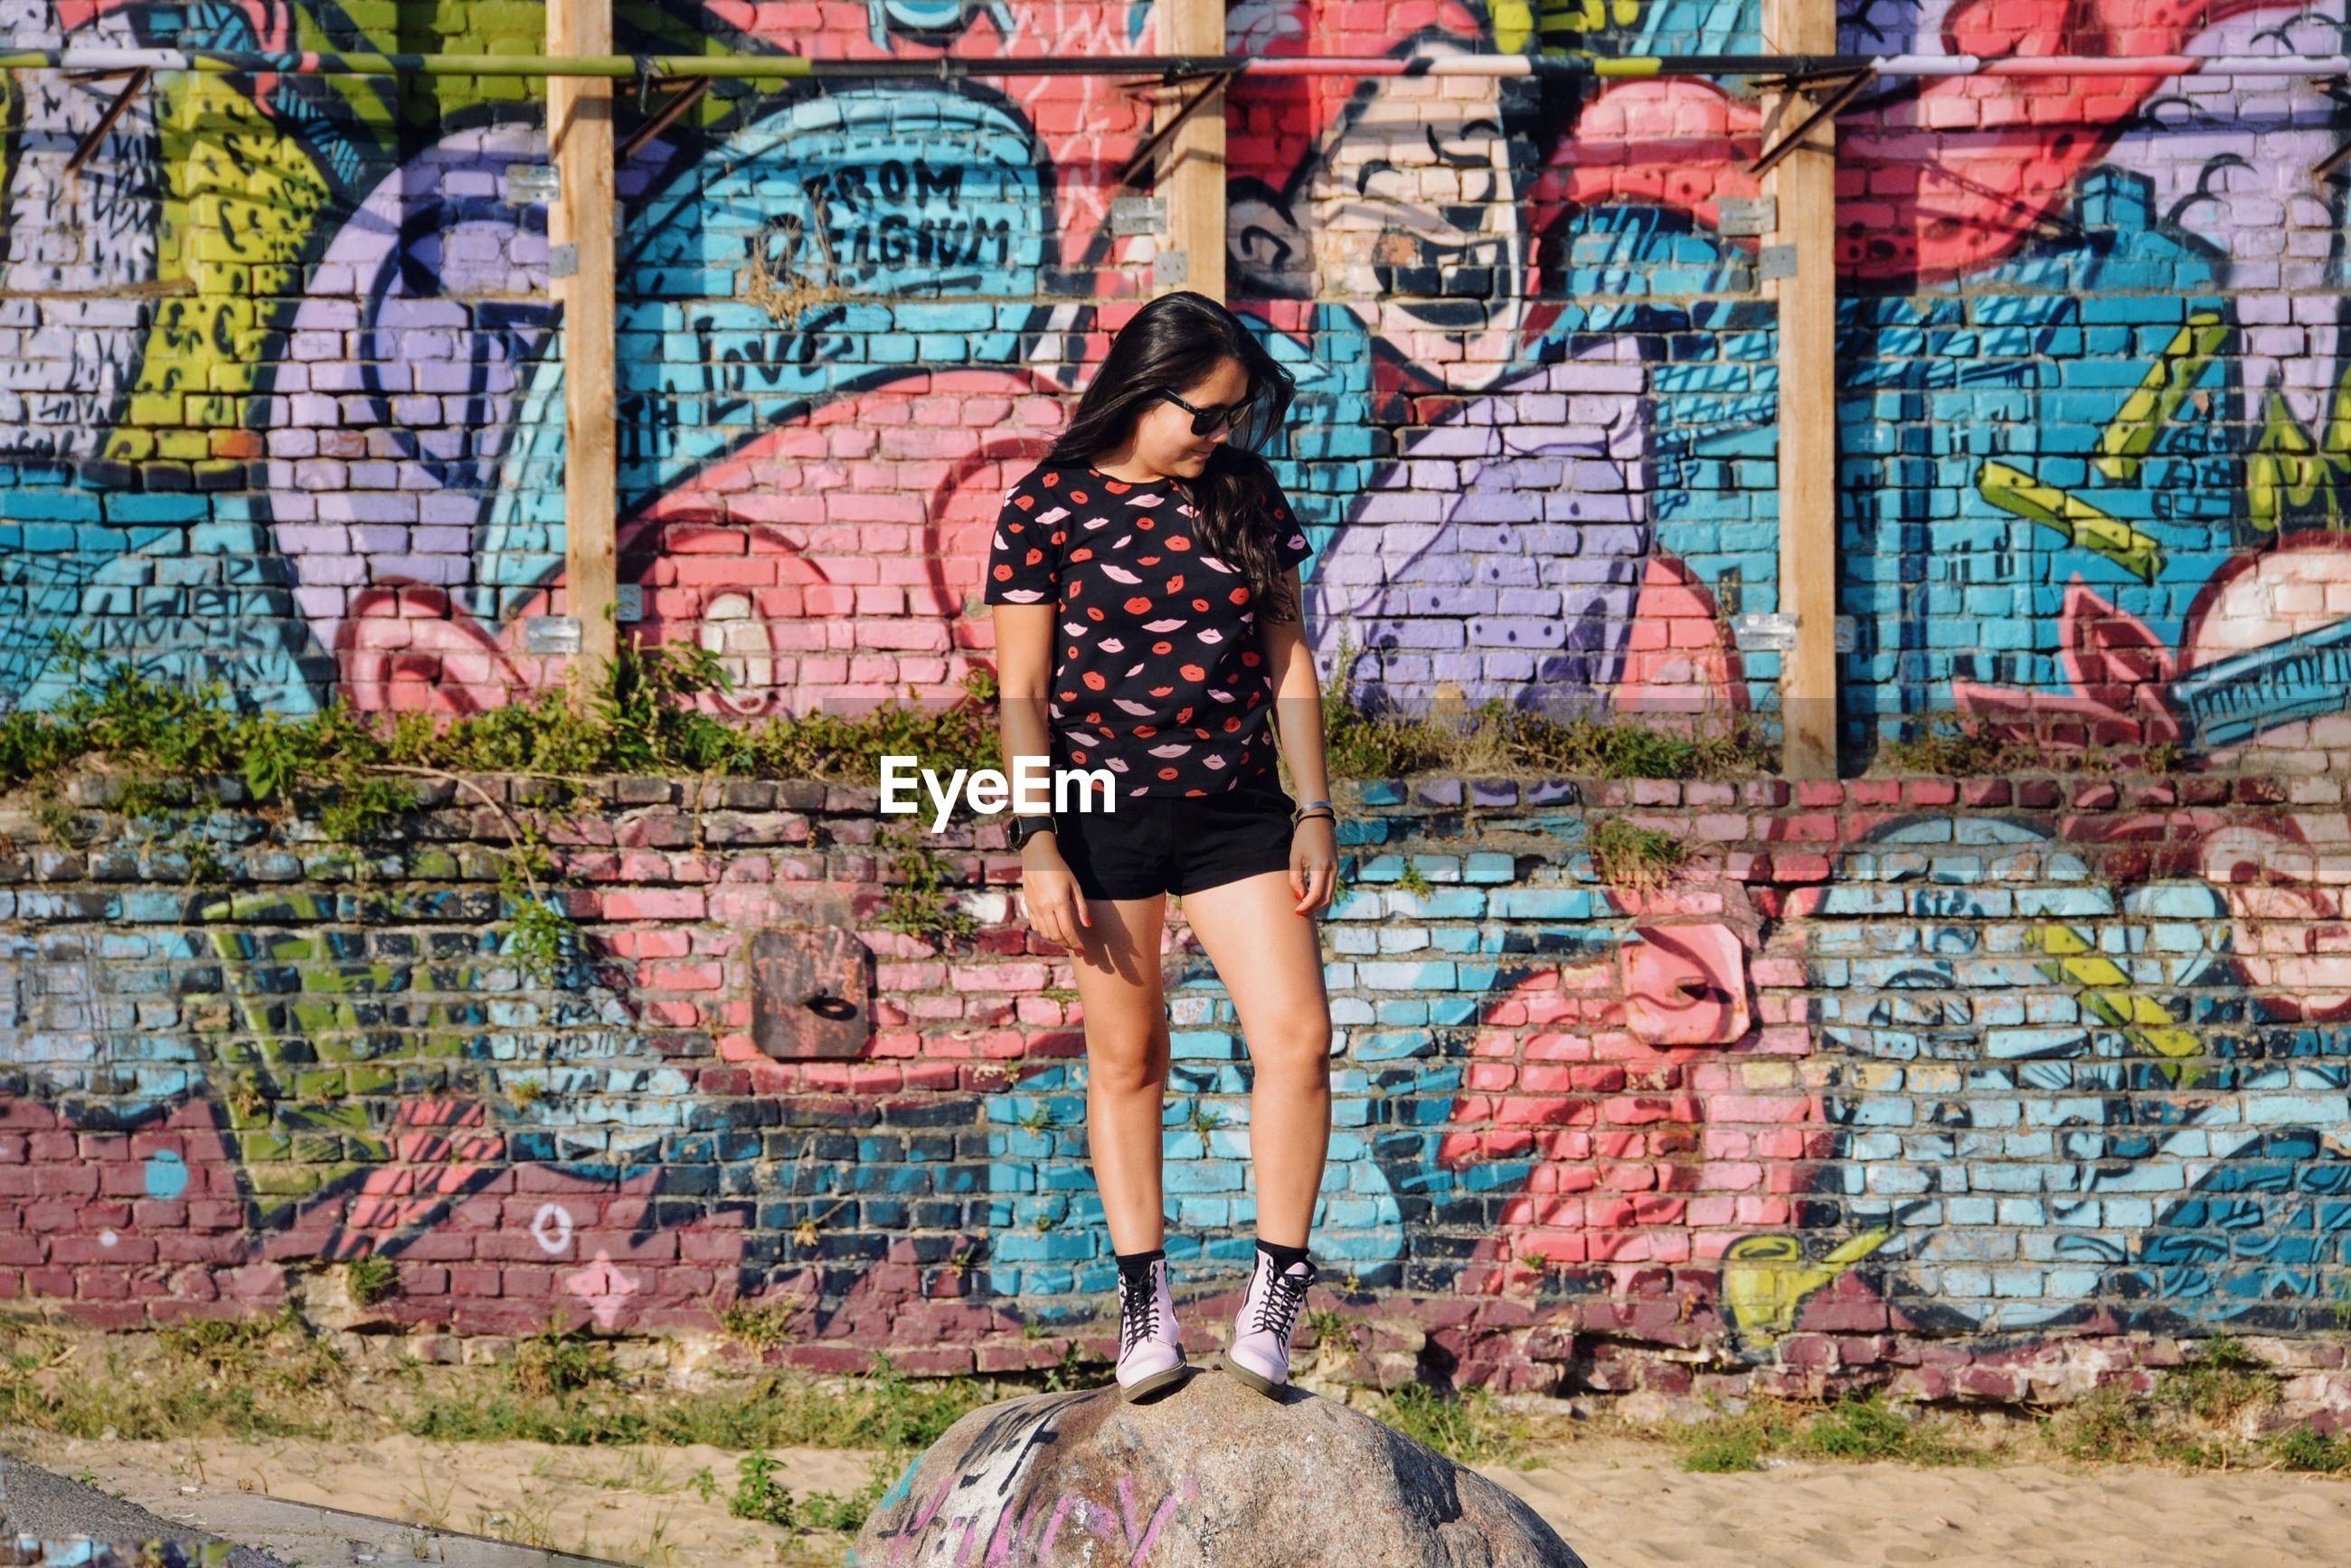 FULL FRAME SHOT OF WOMAN WITH GRAFFITI WALL